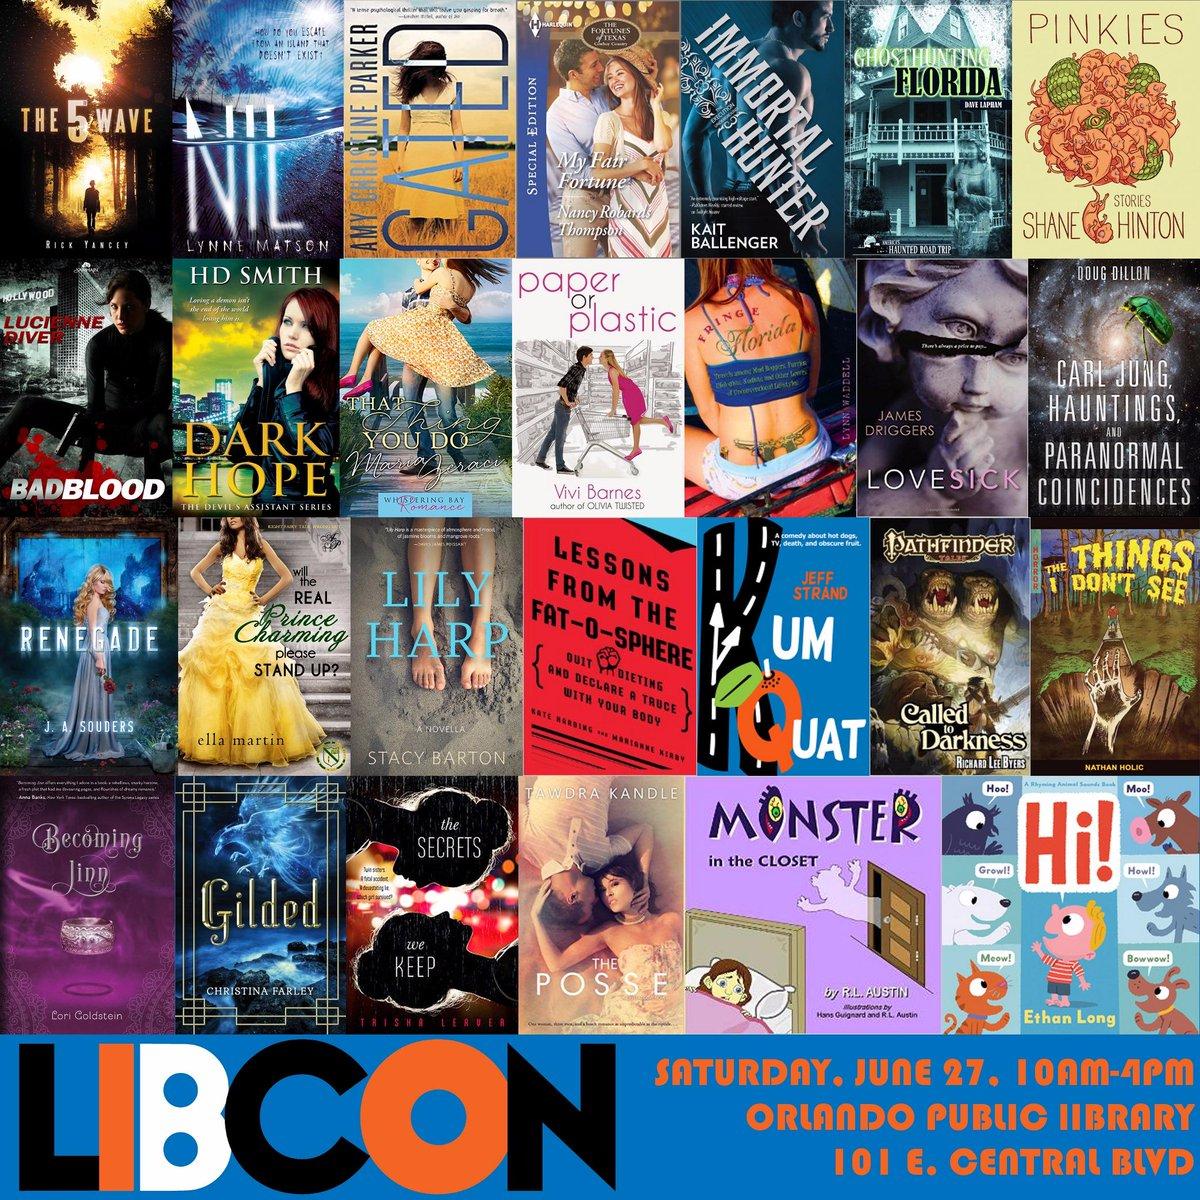 27 amazing authors in Orlando on June 27th! https://t.co/BiGUNjHc7f #myorlando #orlandodoesntsuck #dto #amreading http://t.co/SNjoDmLL27